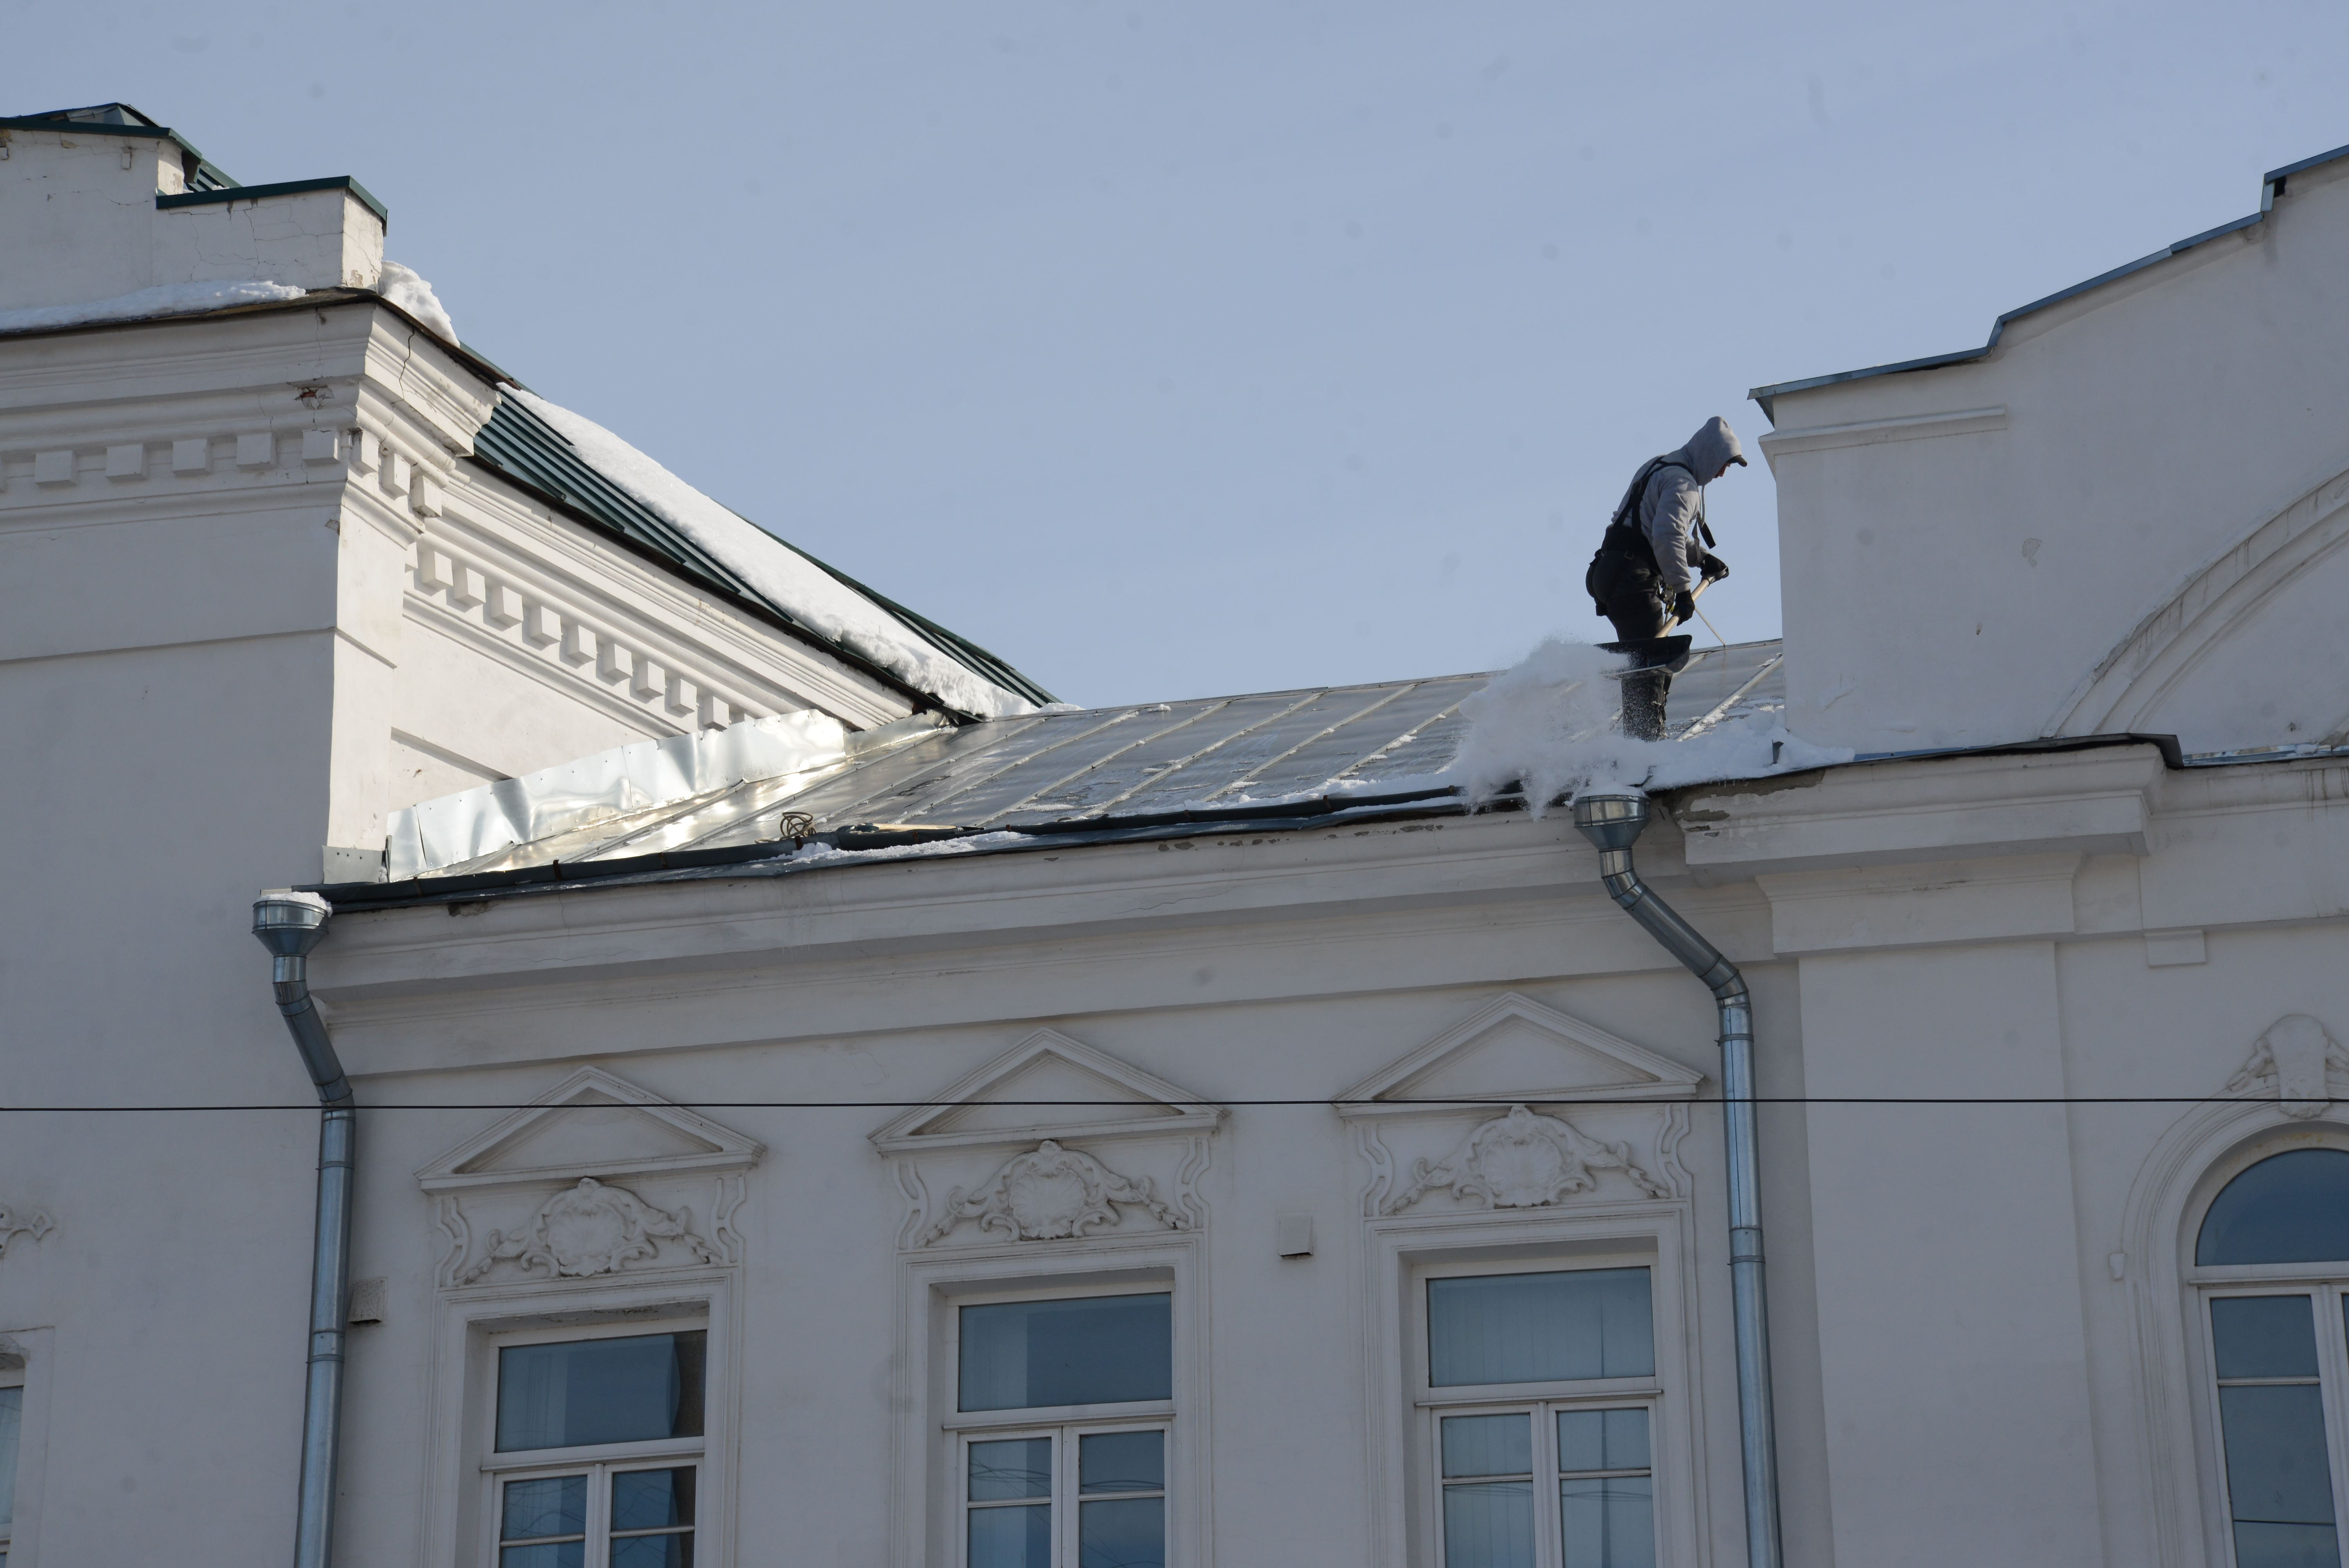 Нормативы очистки крыш от снега